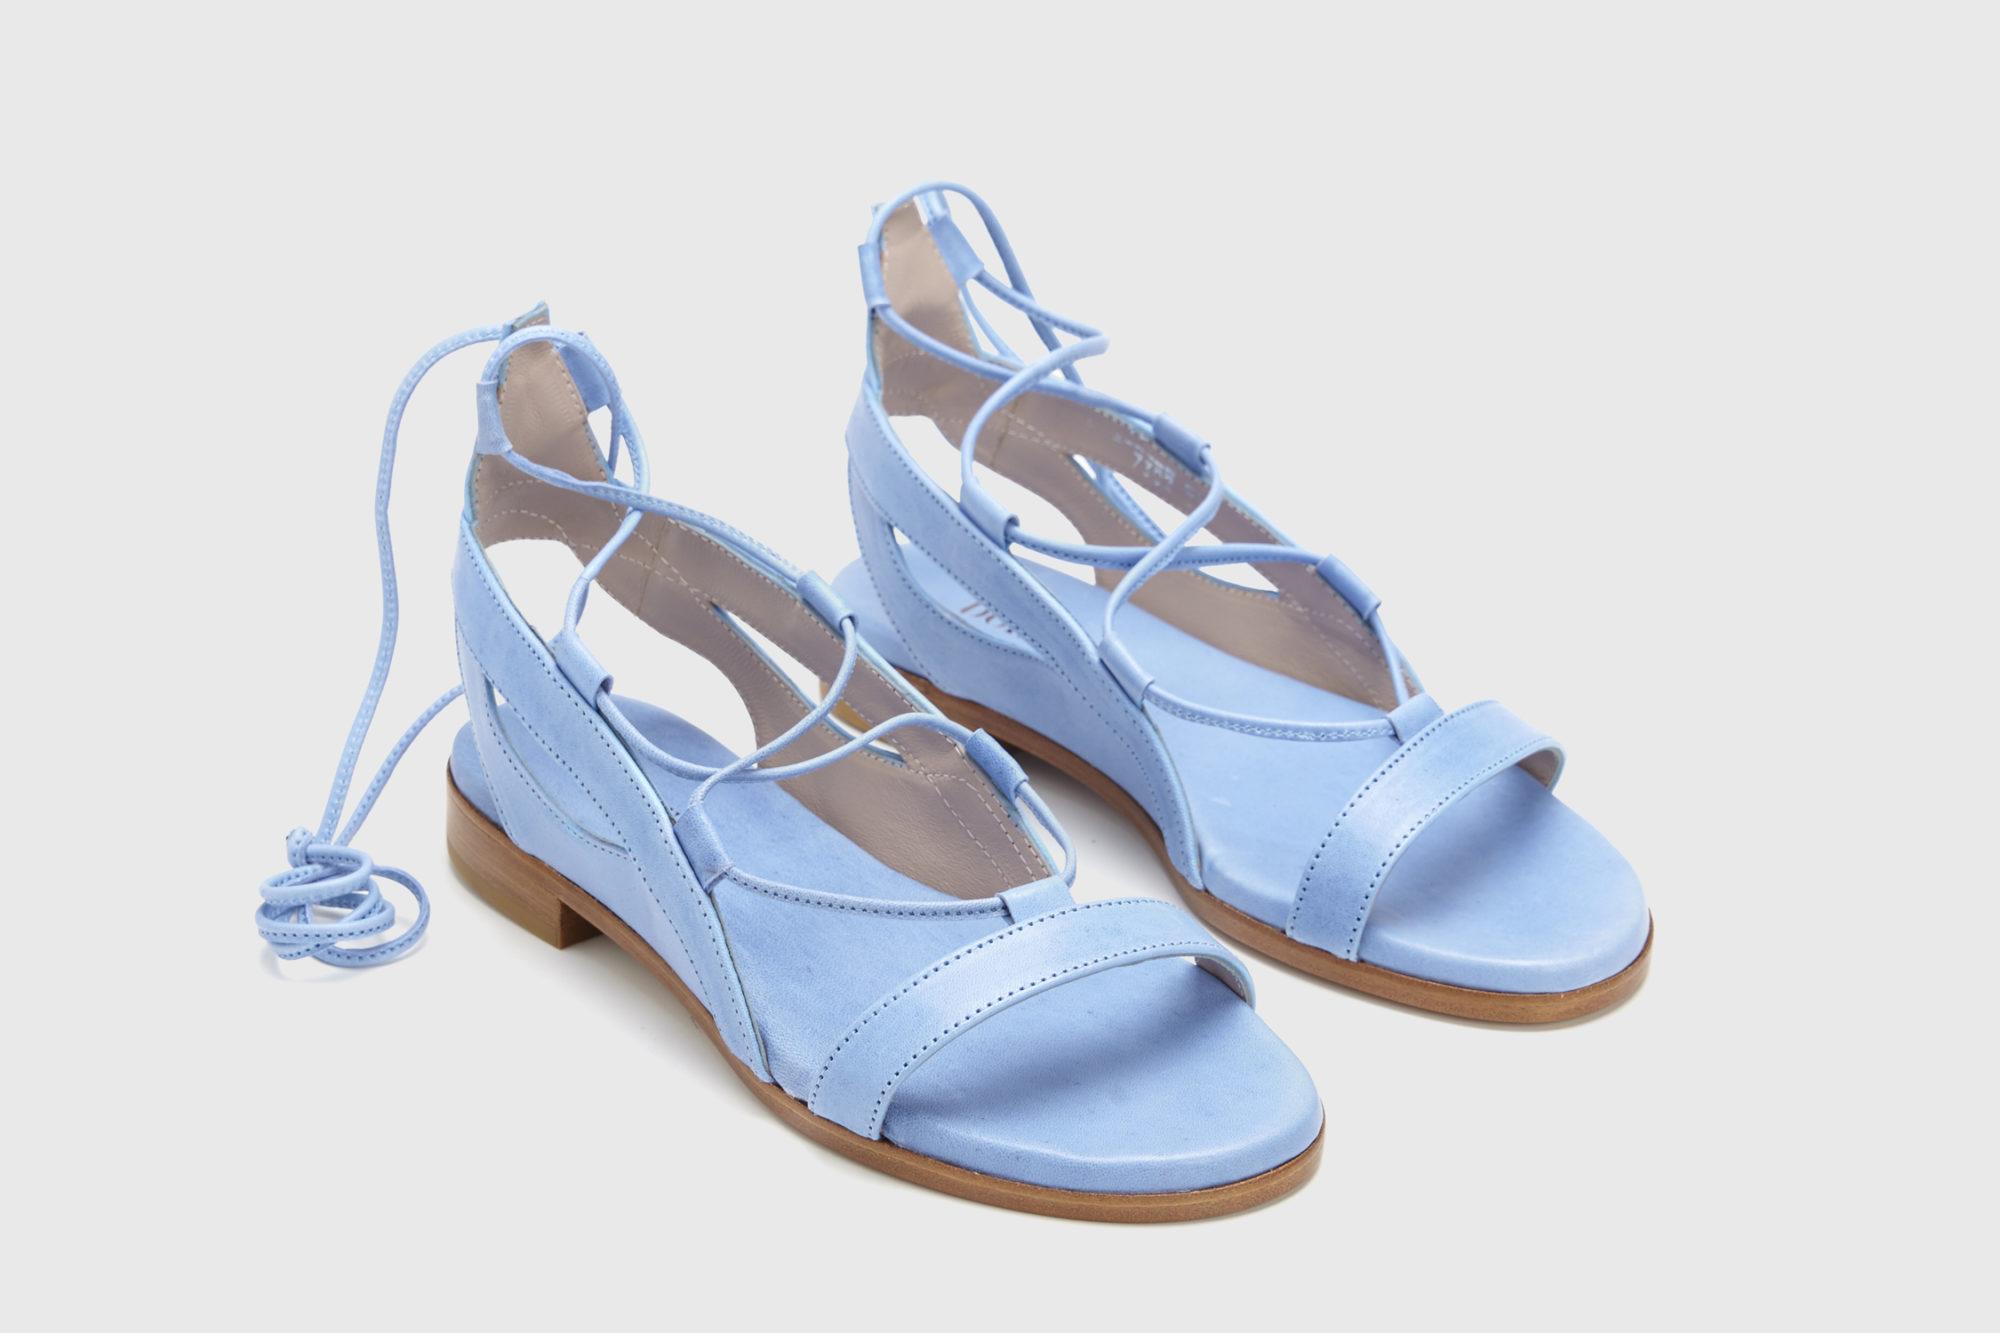 Dorotea sandalia plana Alia azul ss17 par